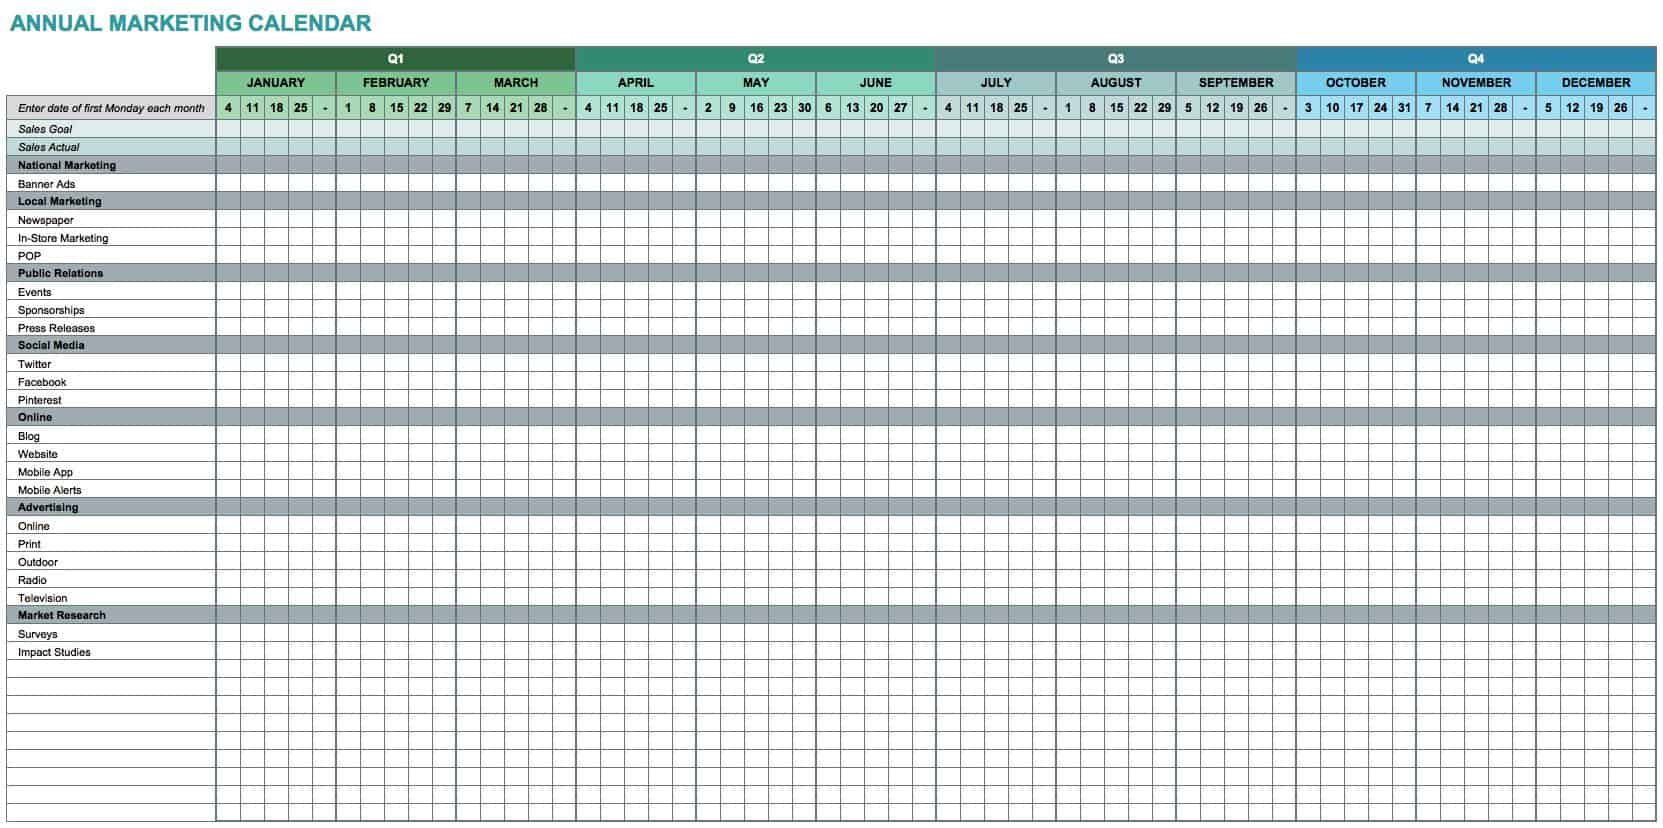 003 Top 52 Week Calendar Template Excel Picture  2020 2019 2021Full